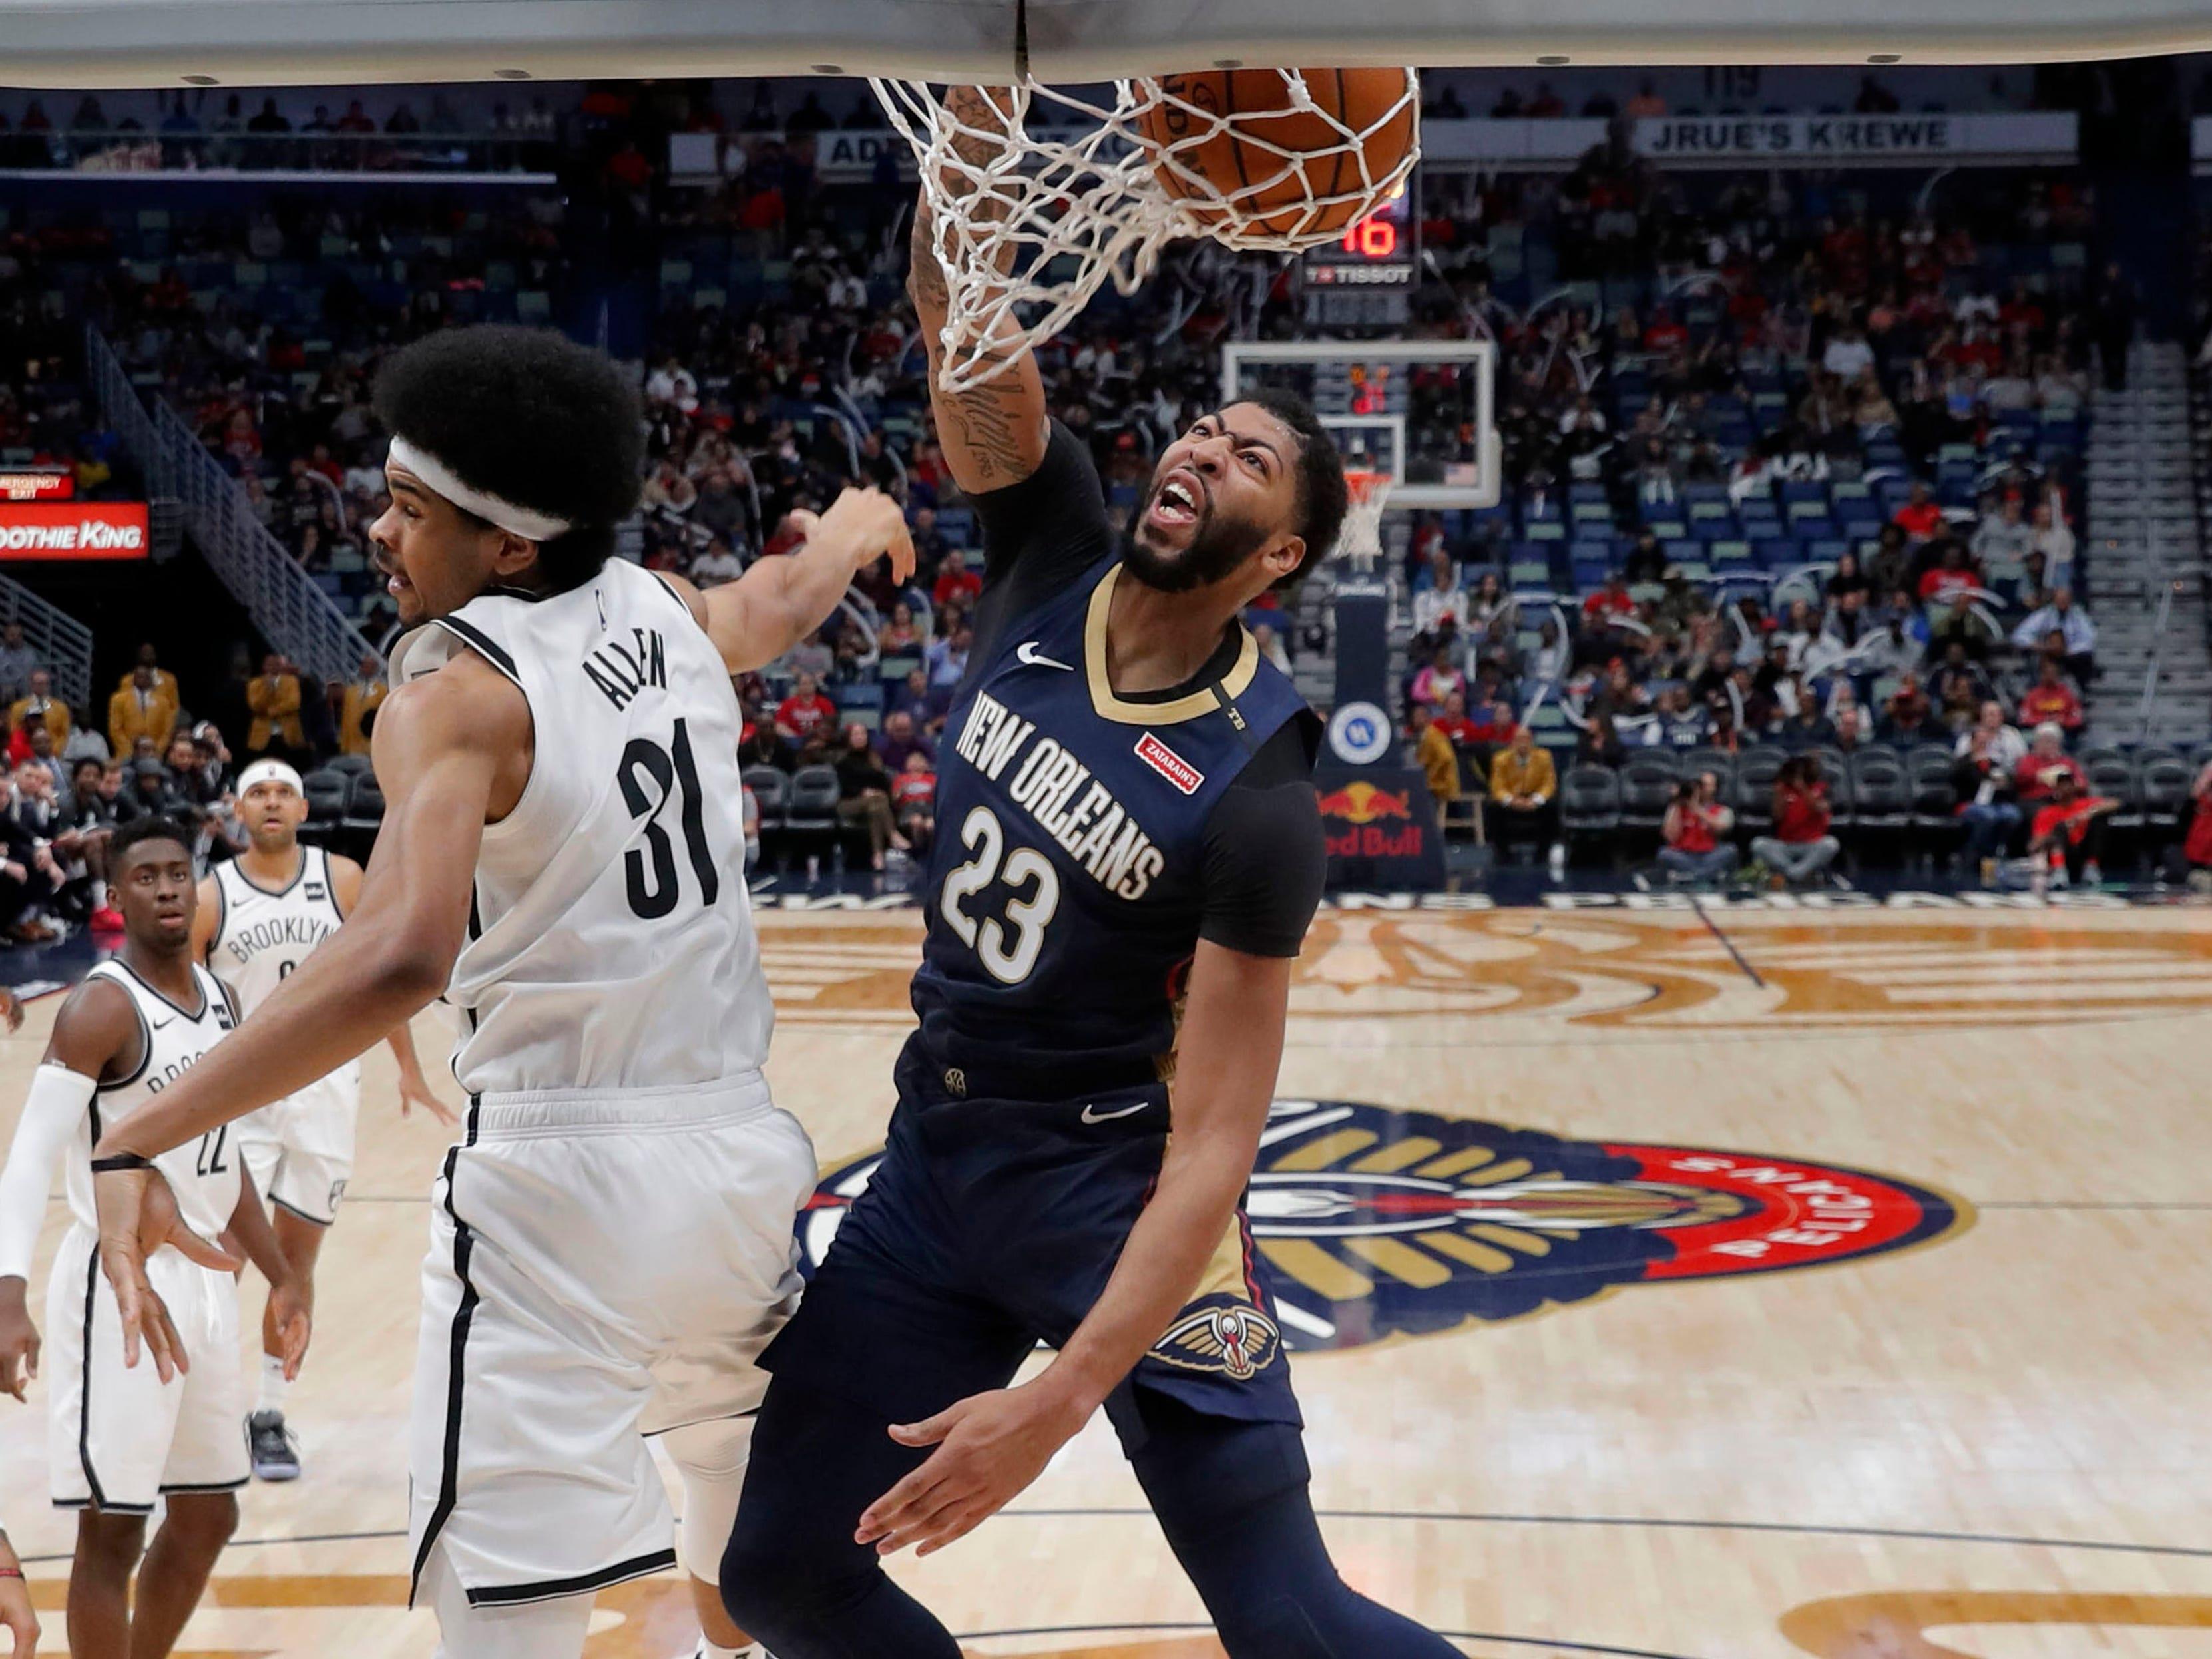 Oct. 26: Pelicans forward Anthony Davis (23) puts down a monster one-handed flush over Nets defender Jarrett Allen (31).